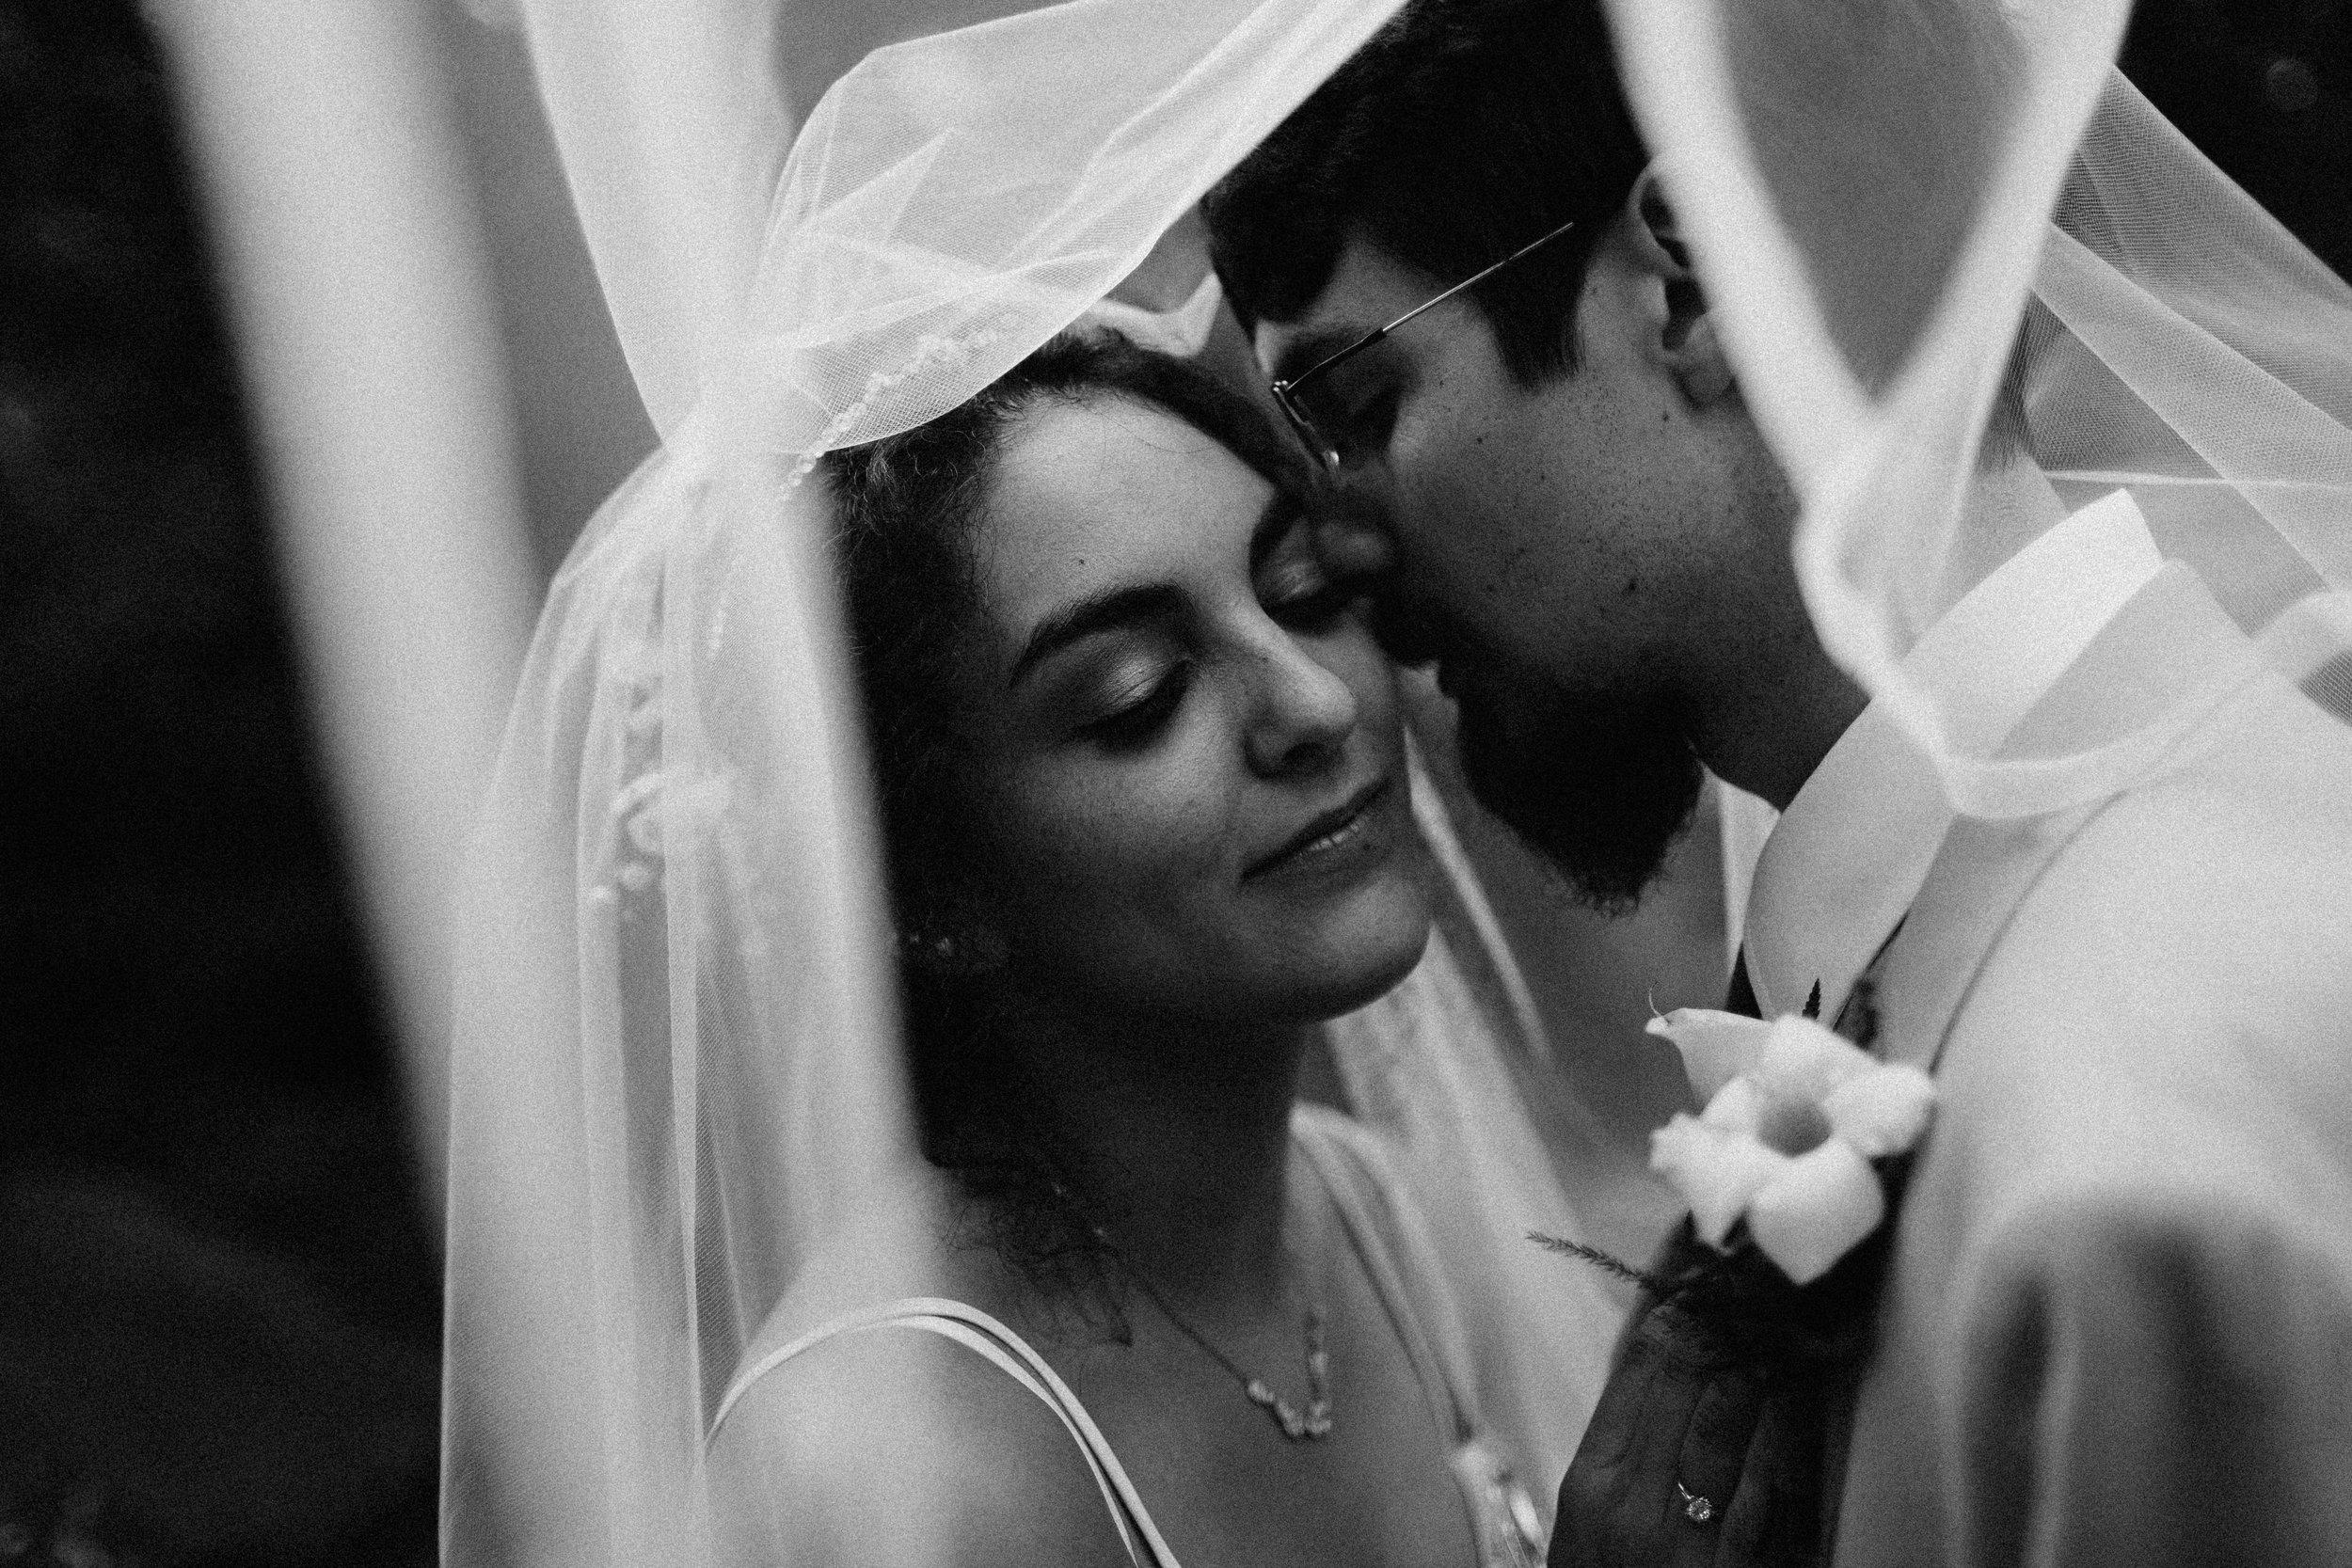 neverland_farms_atlanta_wedding_photographer_documentary_river_west_1992.jpg